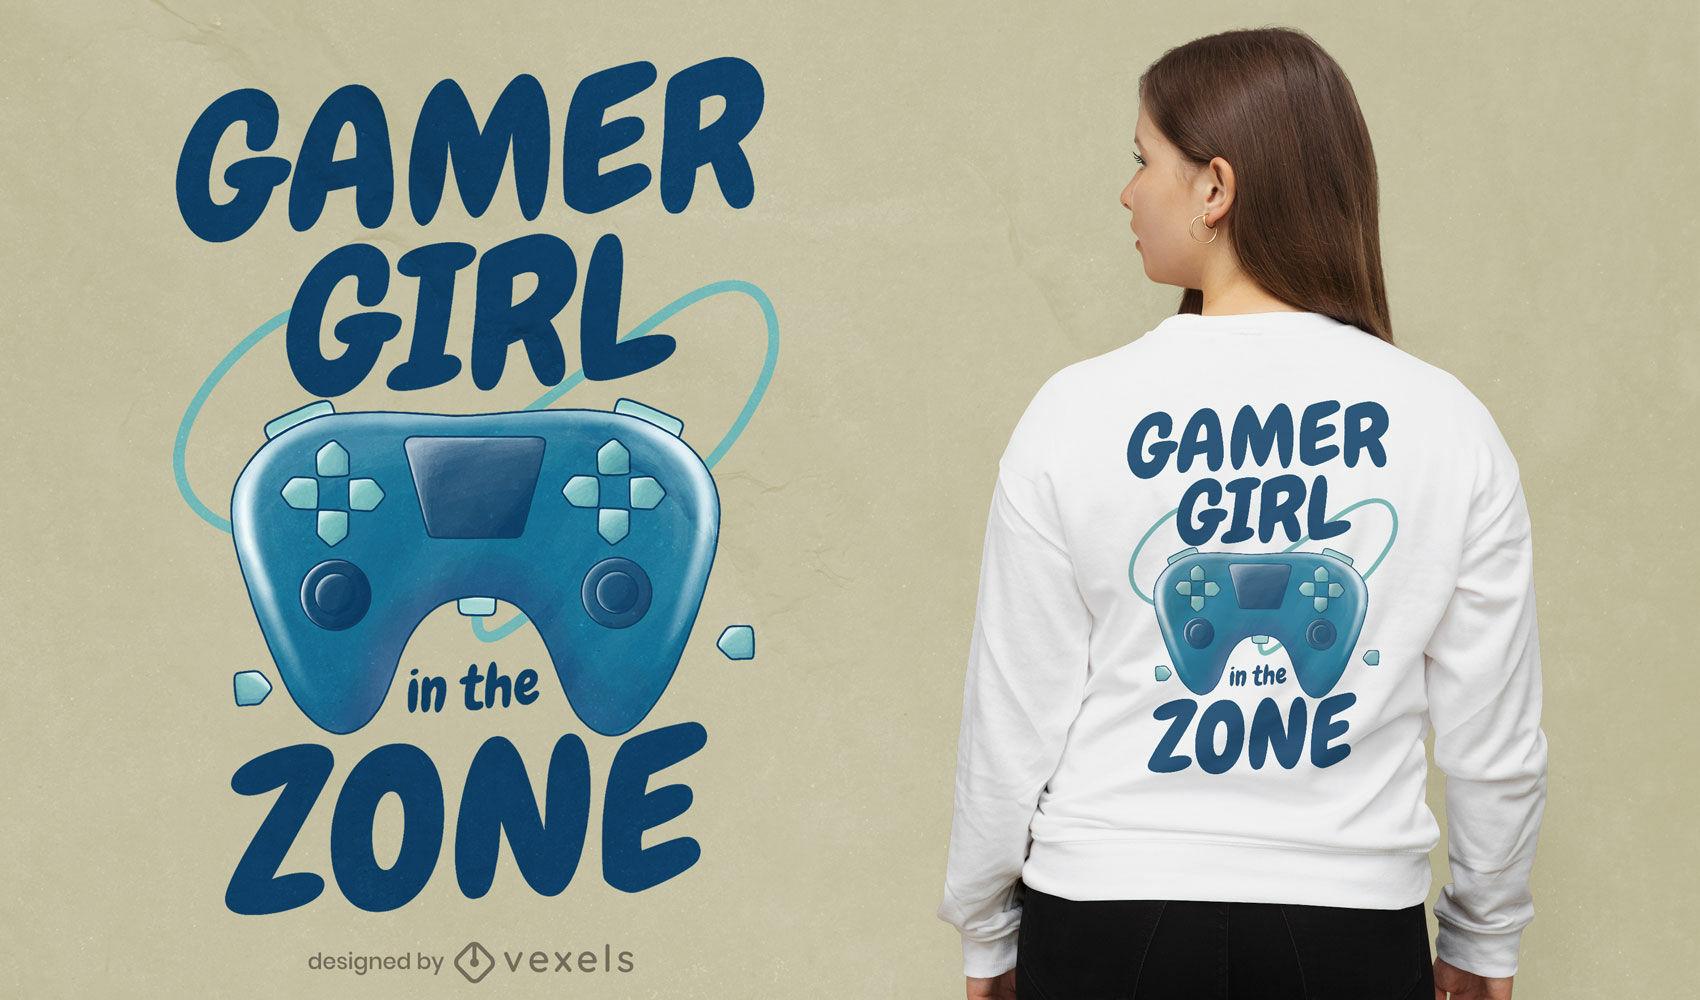 Dise?o de camiseta joystick gamer girl